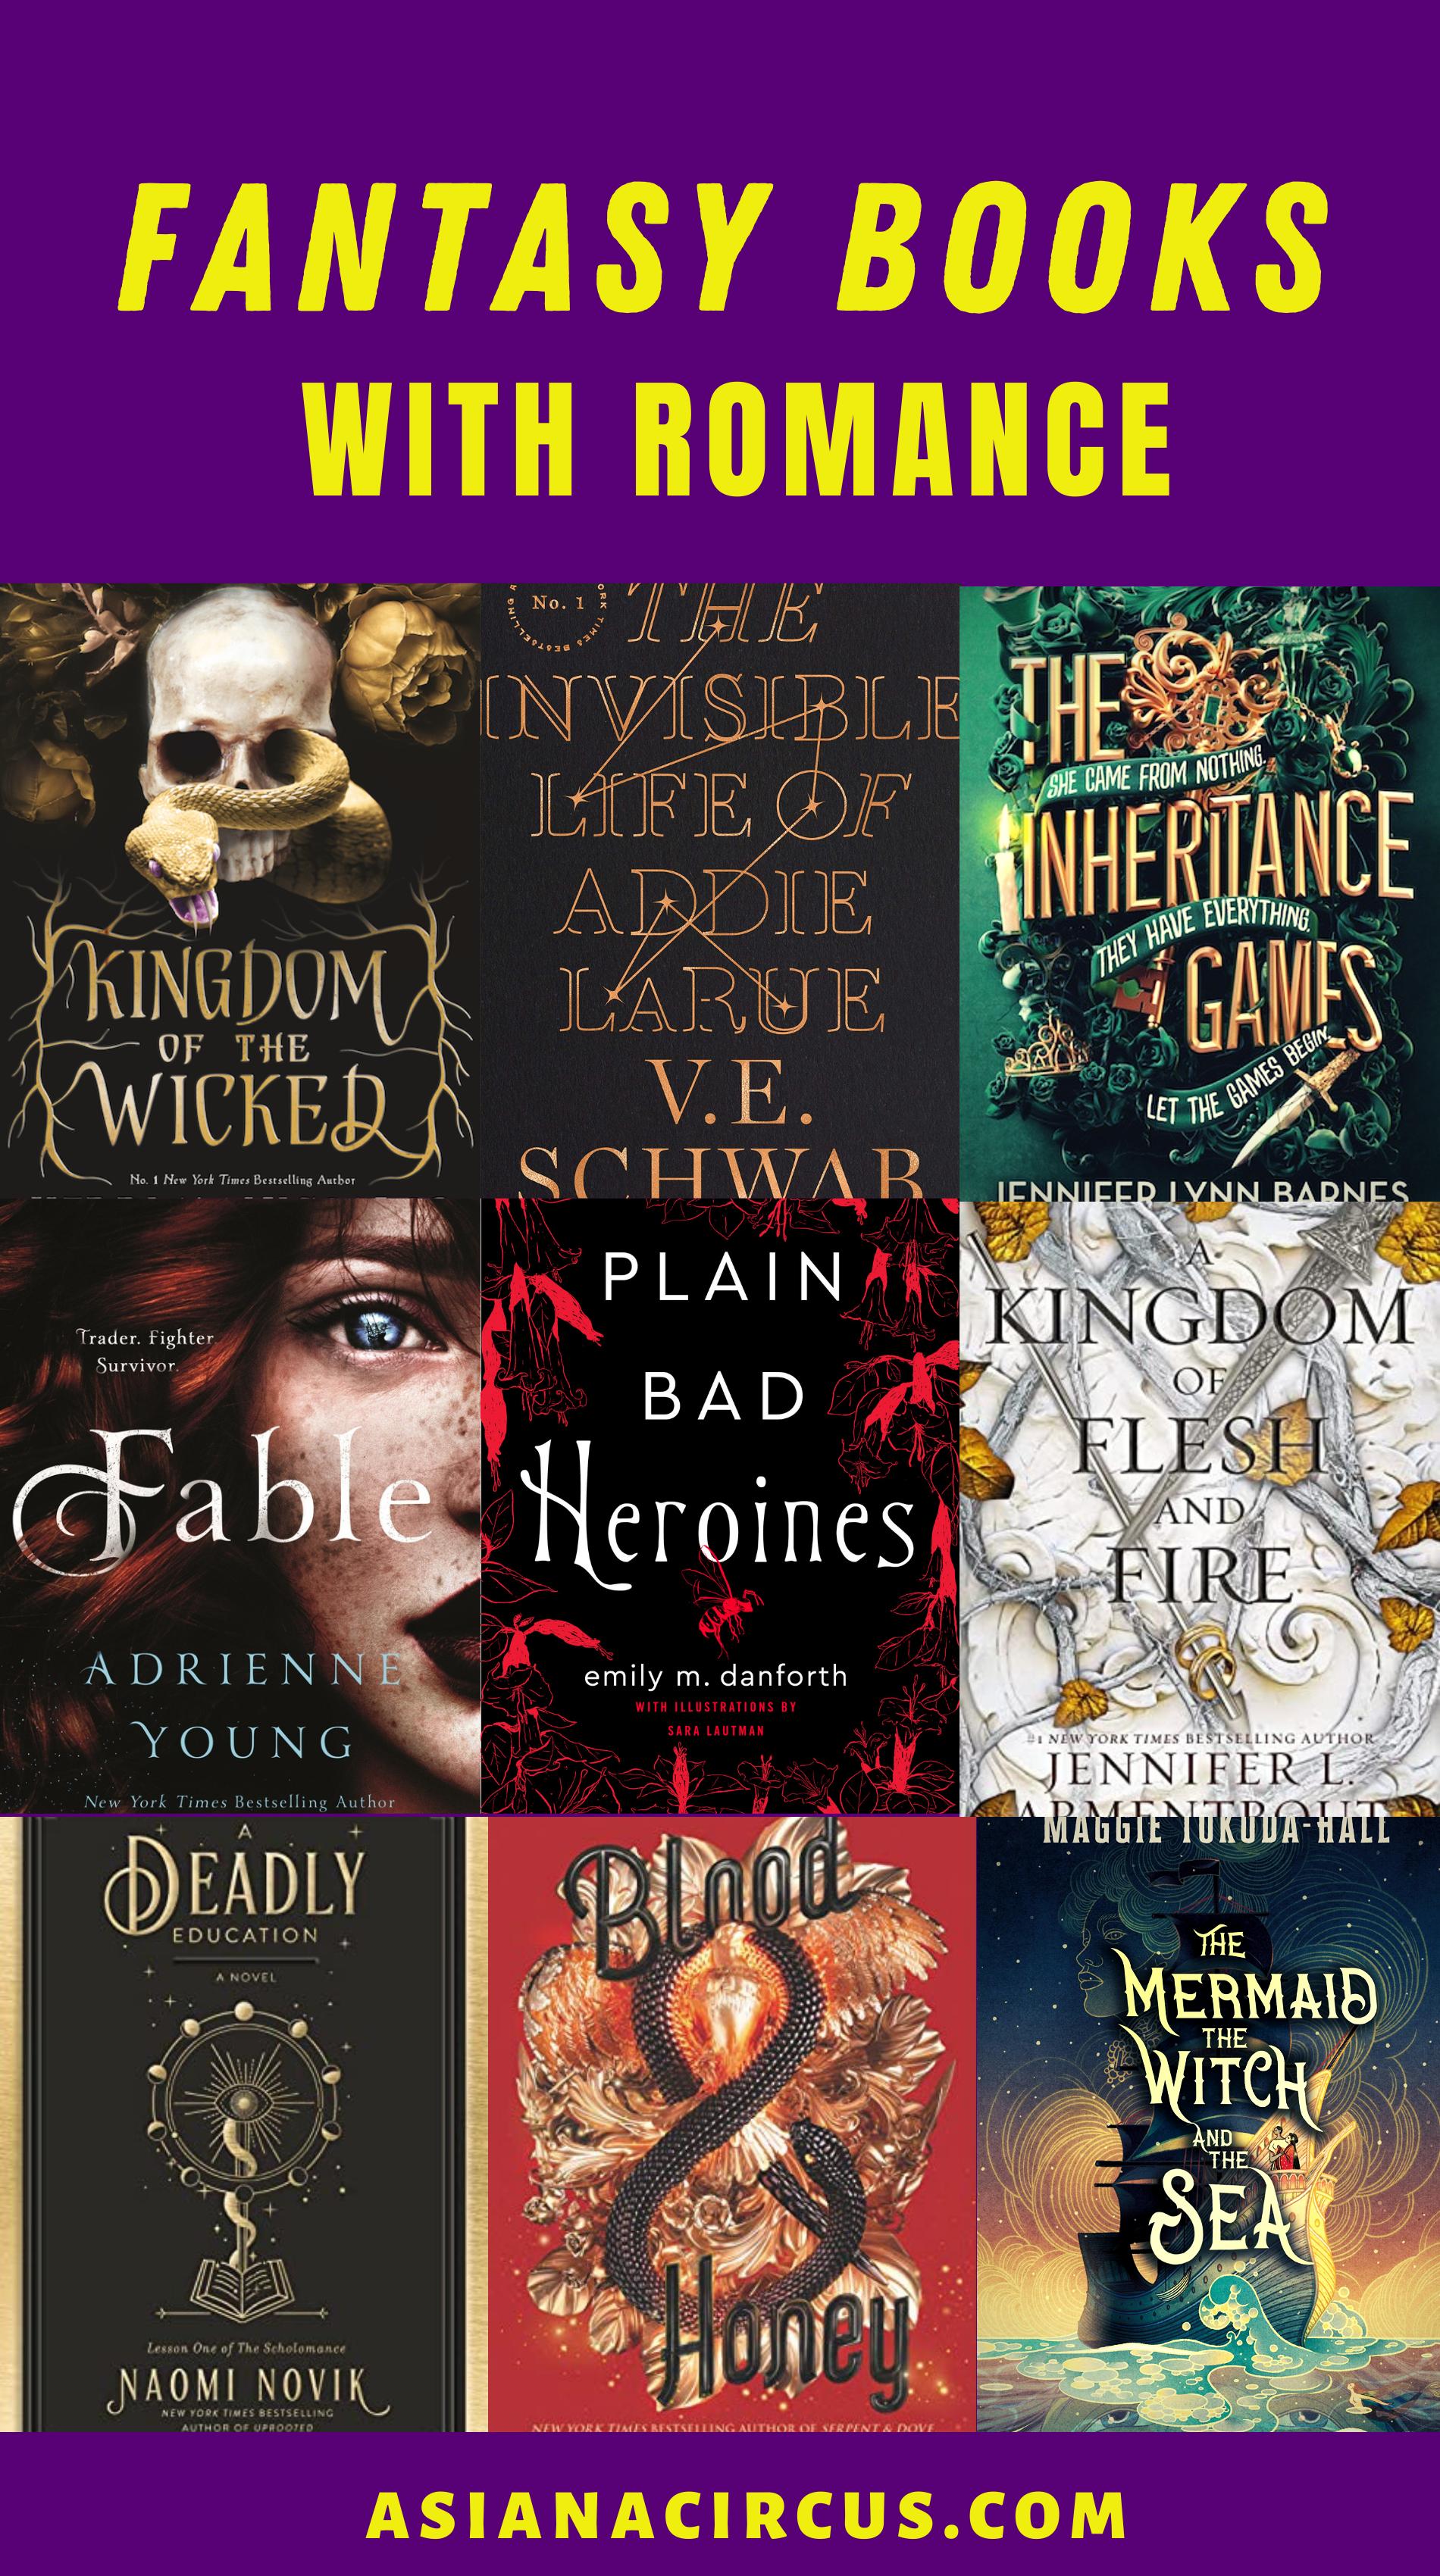 51 Best Romance Fantasy Books Novels To Read 2020 Asiana Circus In 2020 Fantasy Romance Books Fantasy Romance Novels Fantasy Books